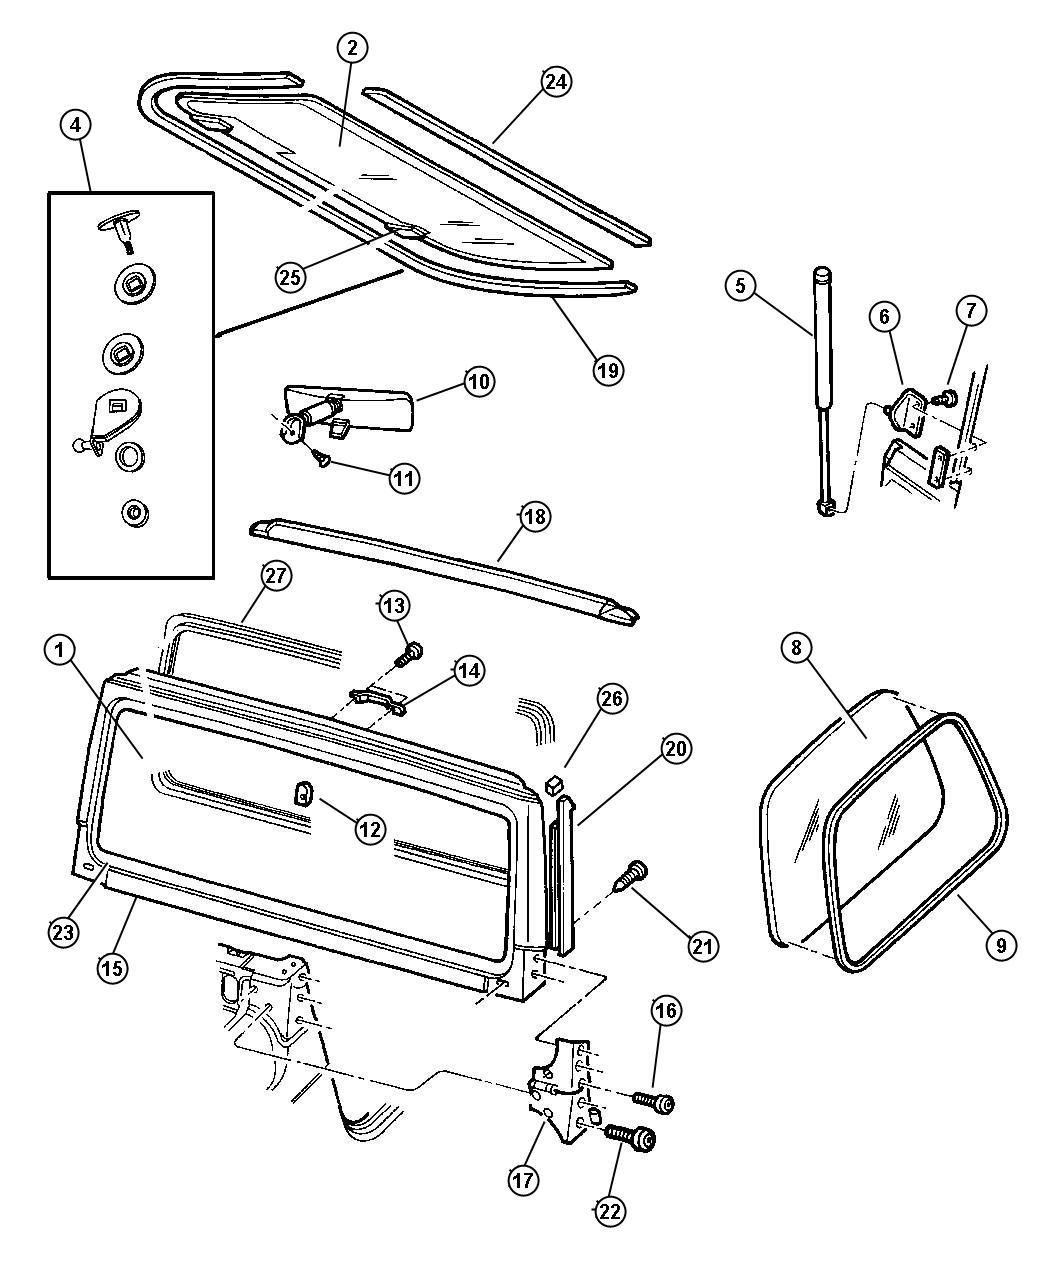 Jeep Wrangler Frame Parts